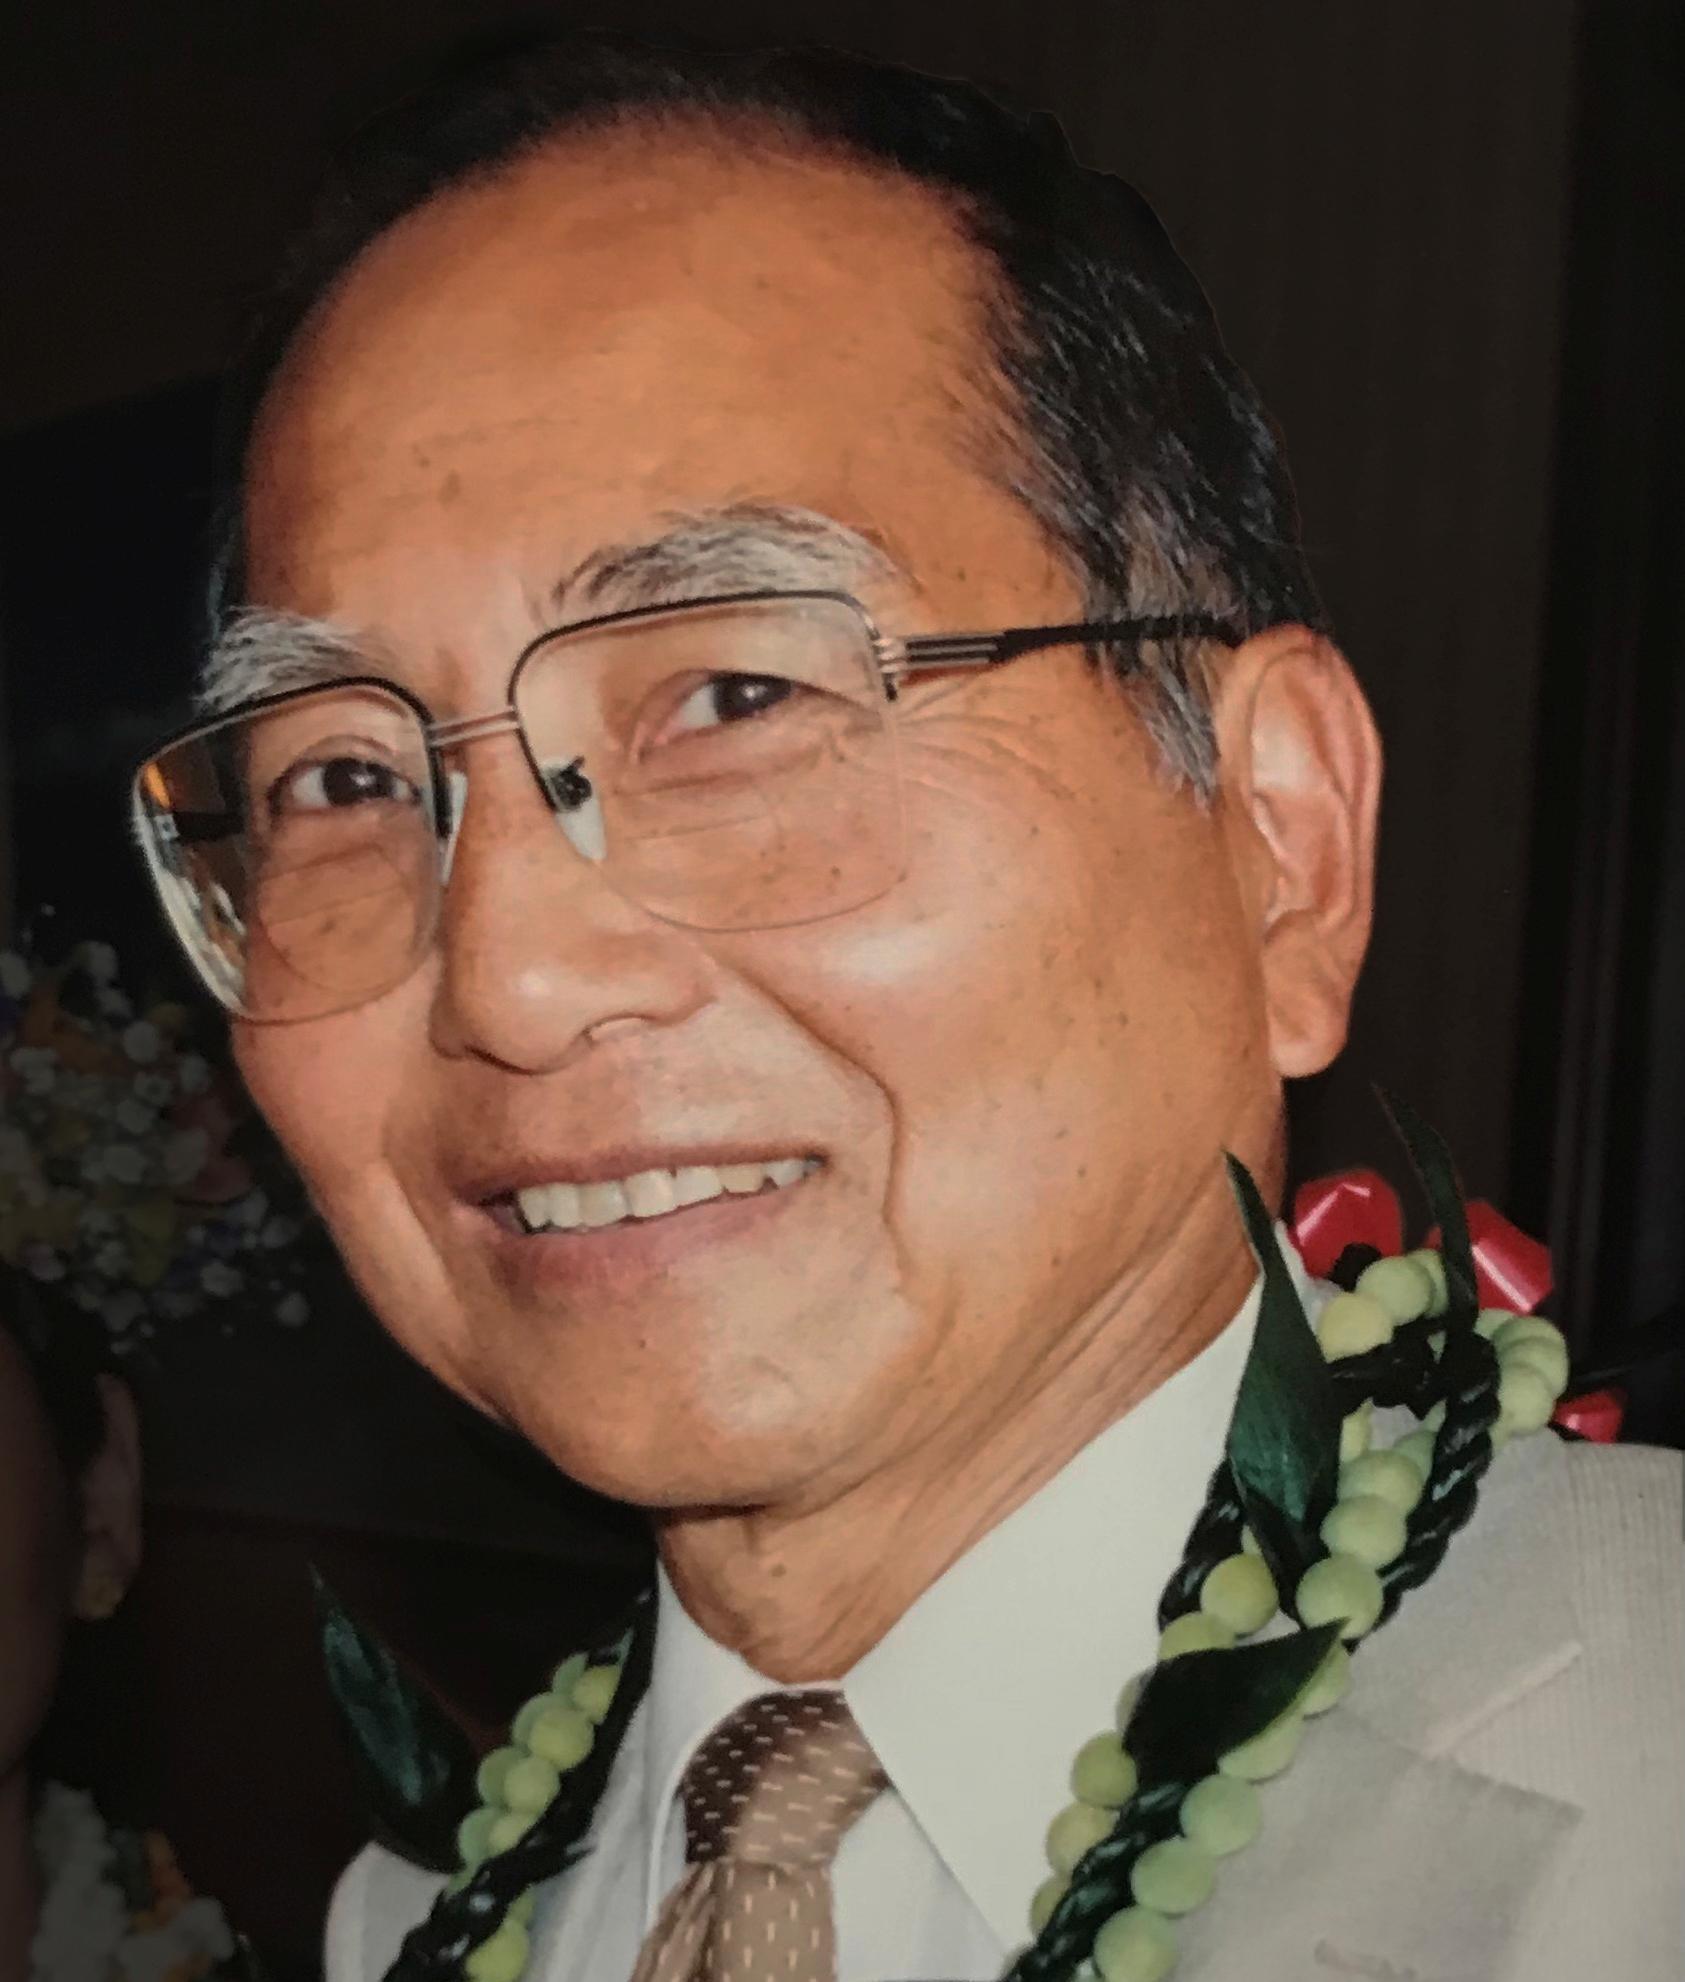 Kazuyoshi Ide